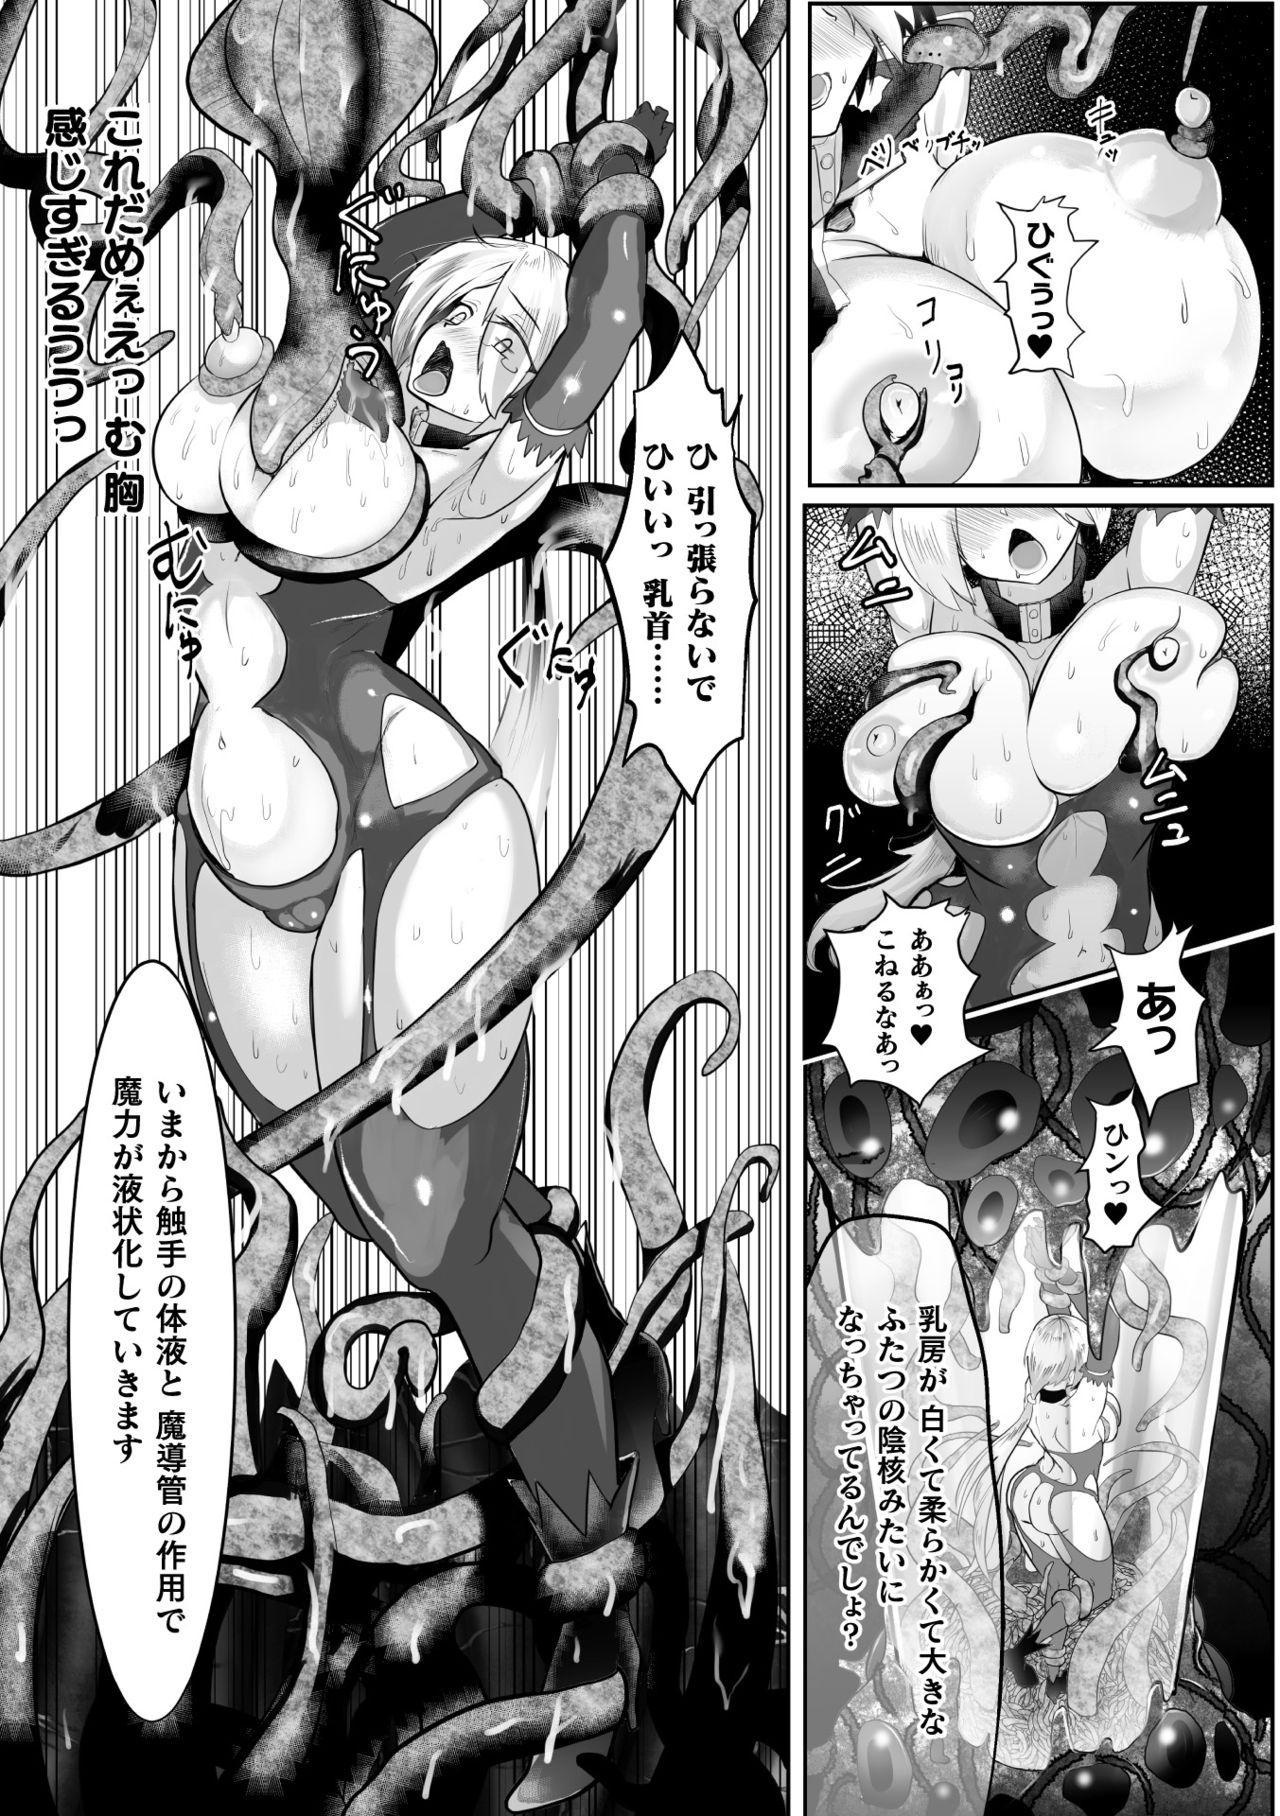 2D Comic Magazine Capsule Kan Seigi no Heroine Mesu Ochi Jikken! Vol. 2 54